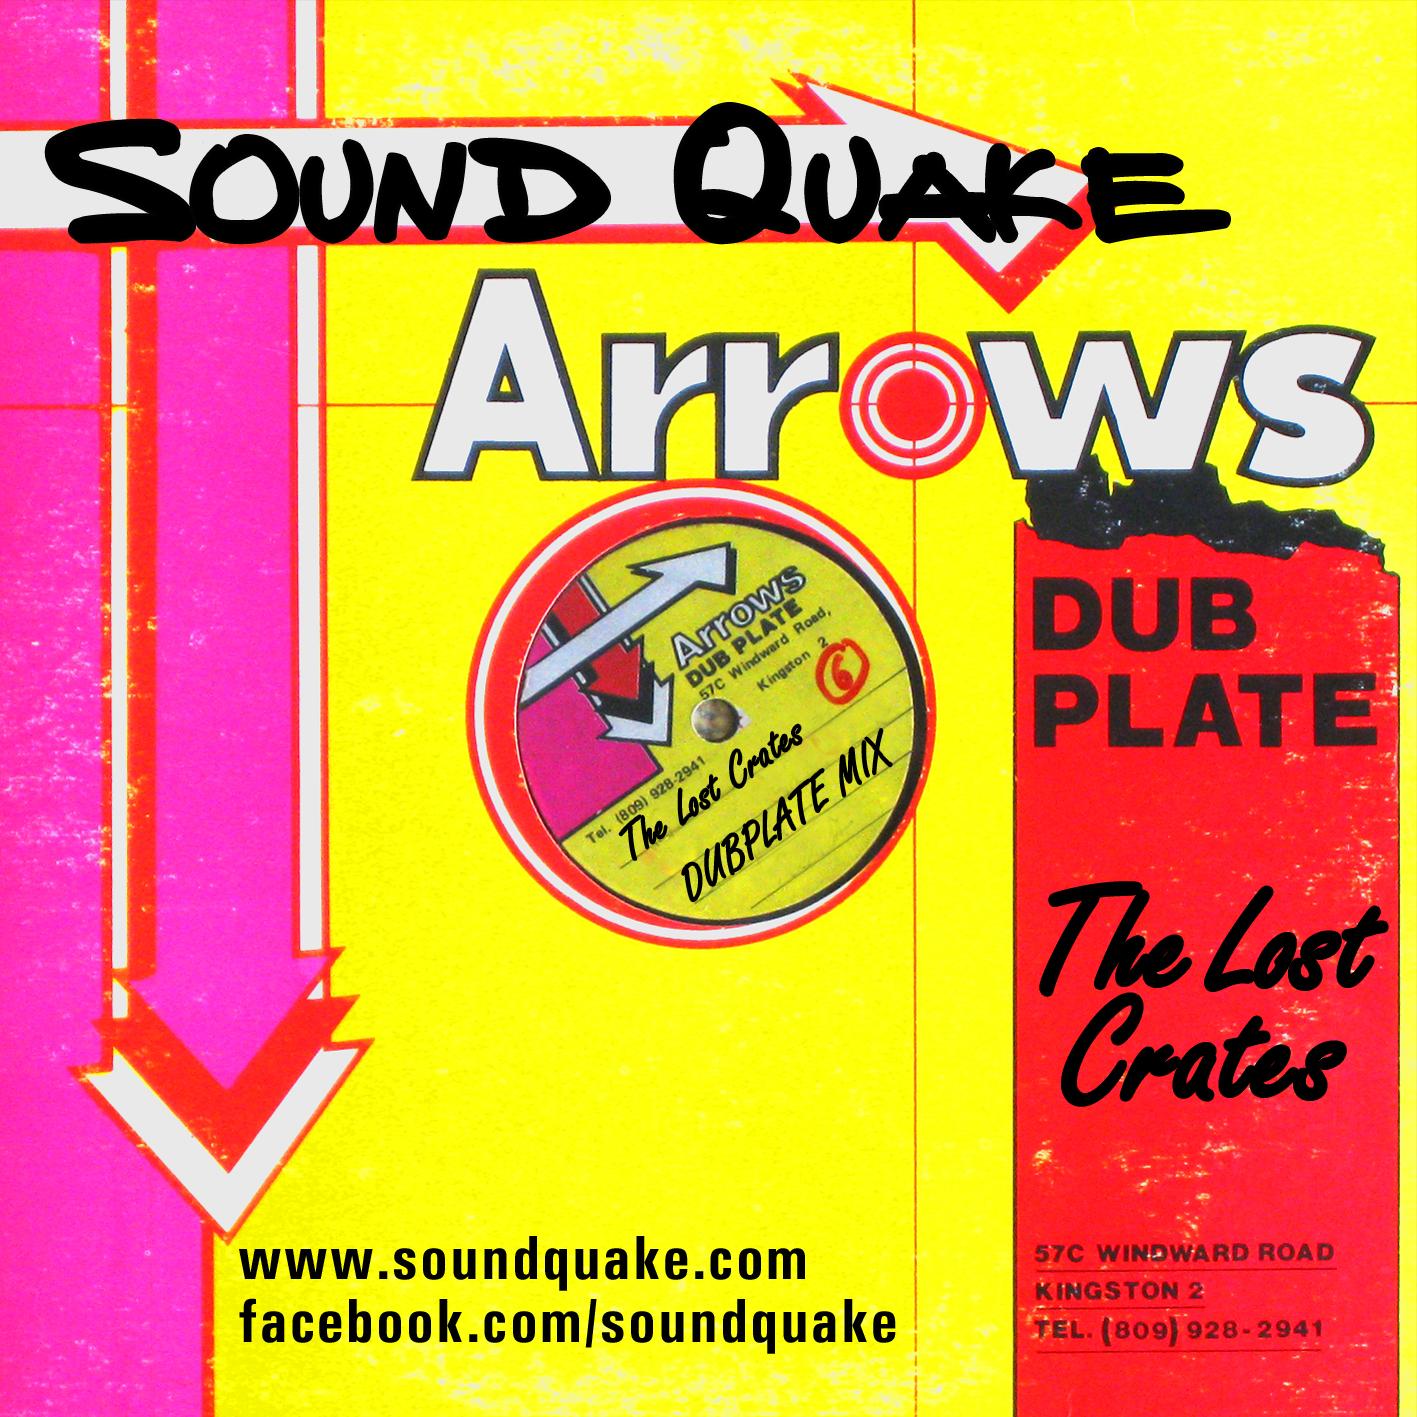 SoundQuake_TheLostCrates_DubplateMix_Cov